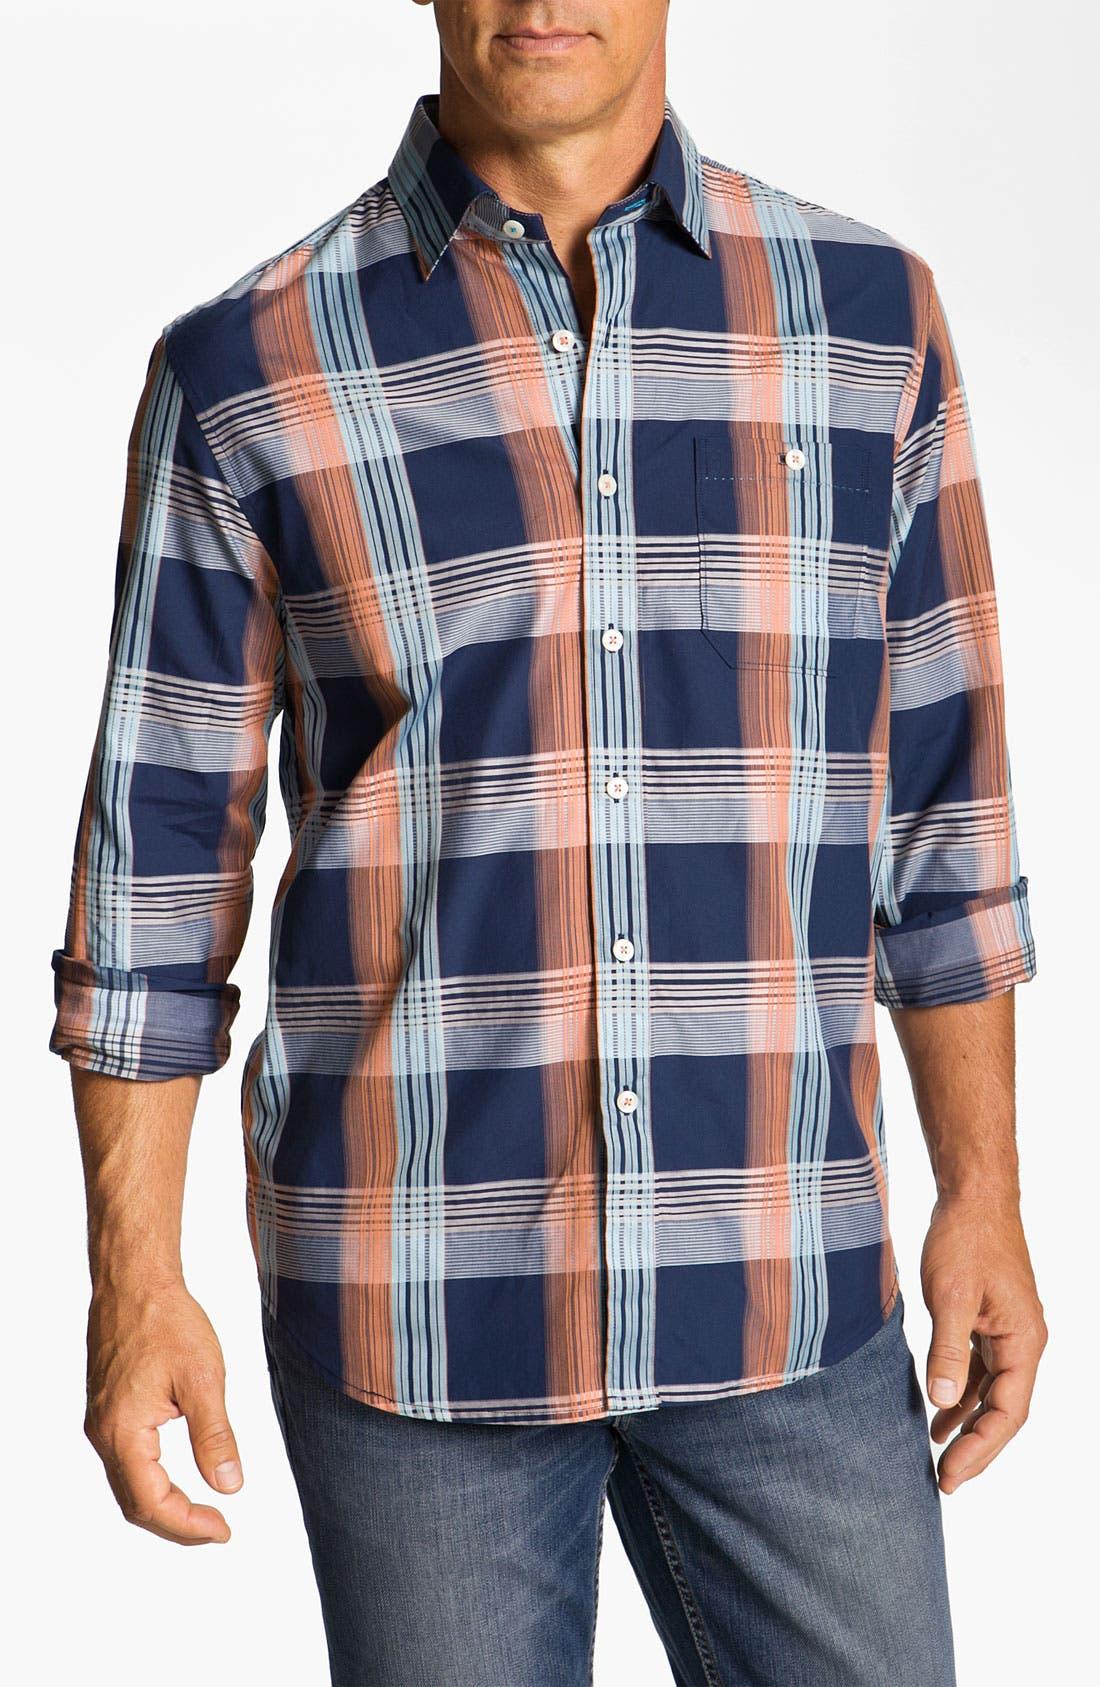 Alternate Image 1 Selected - Tommy Bahama 'Tamarind Plain' Sport Shirt